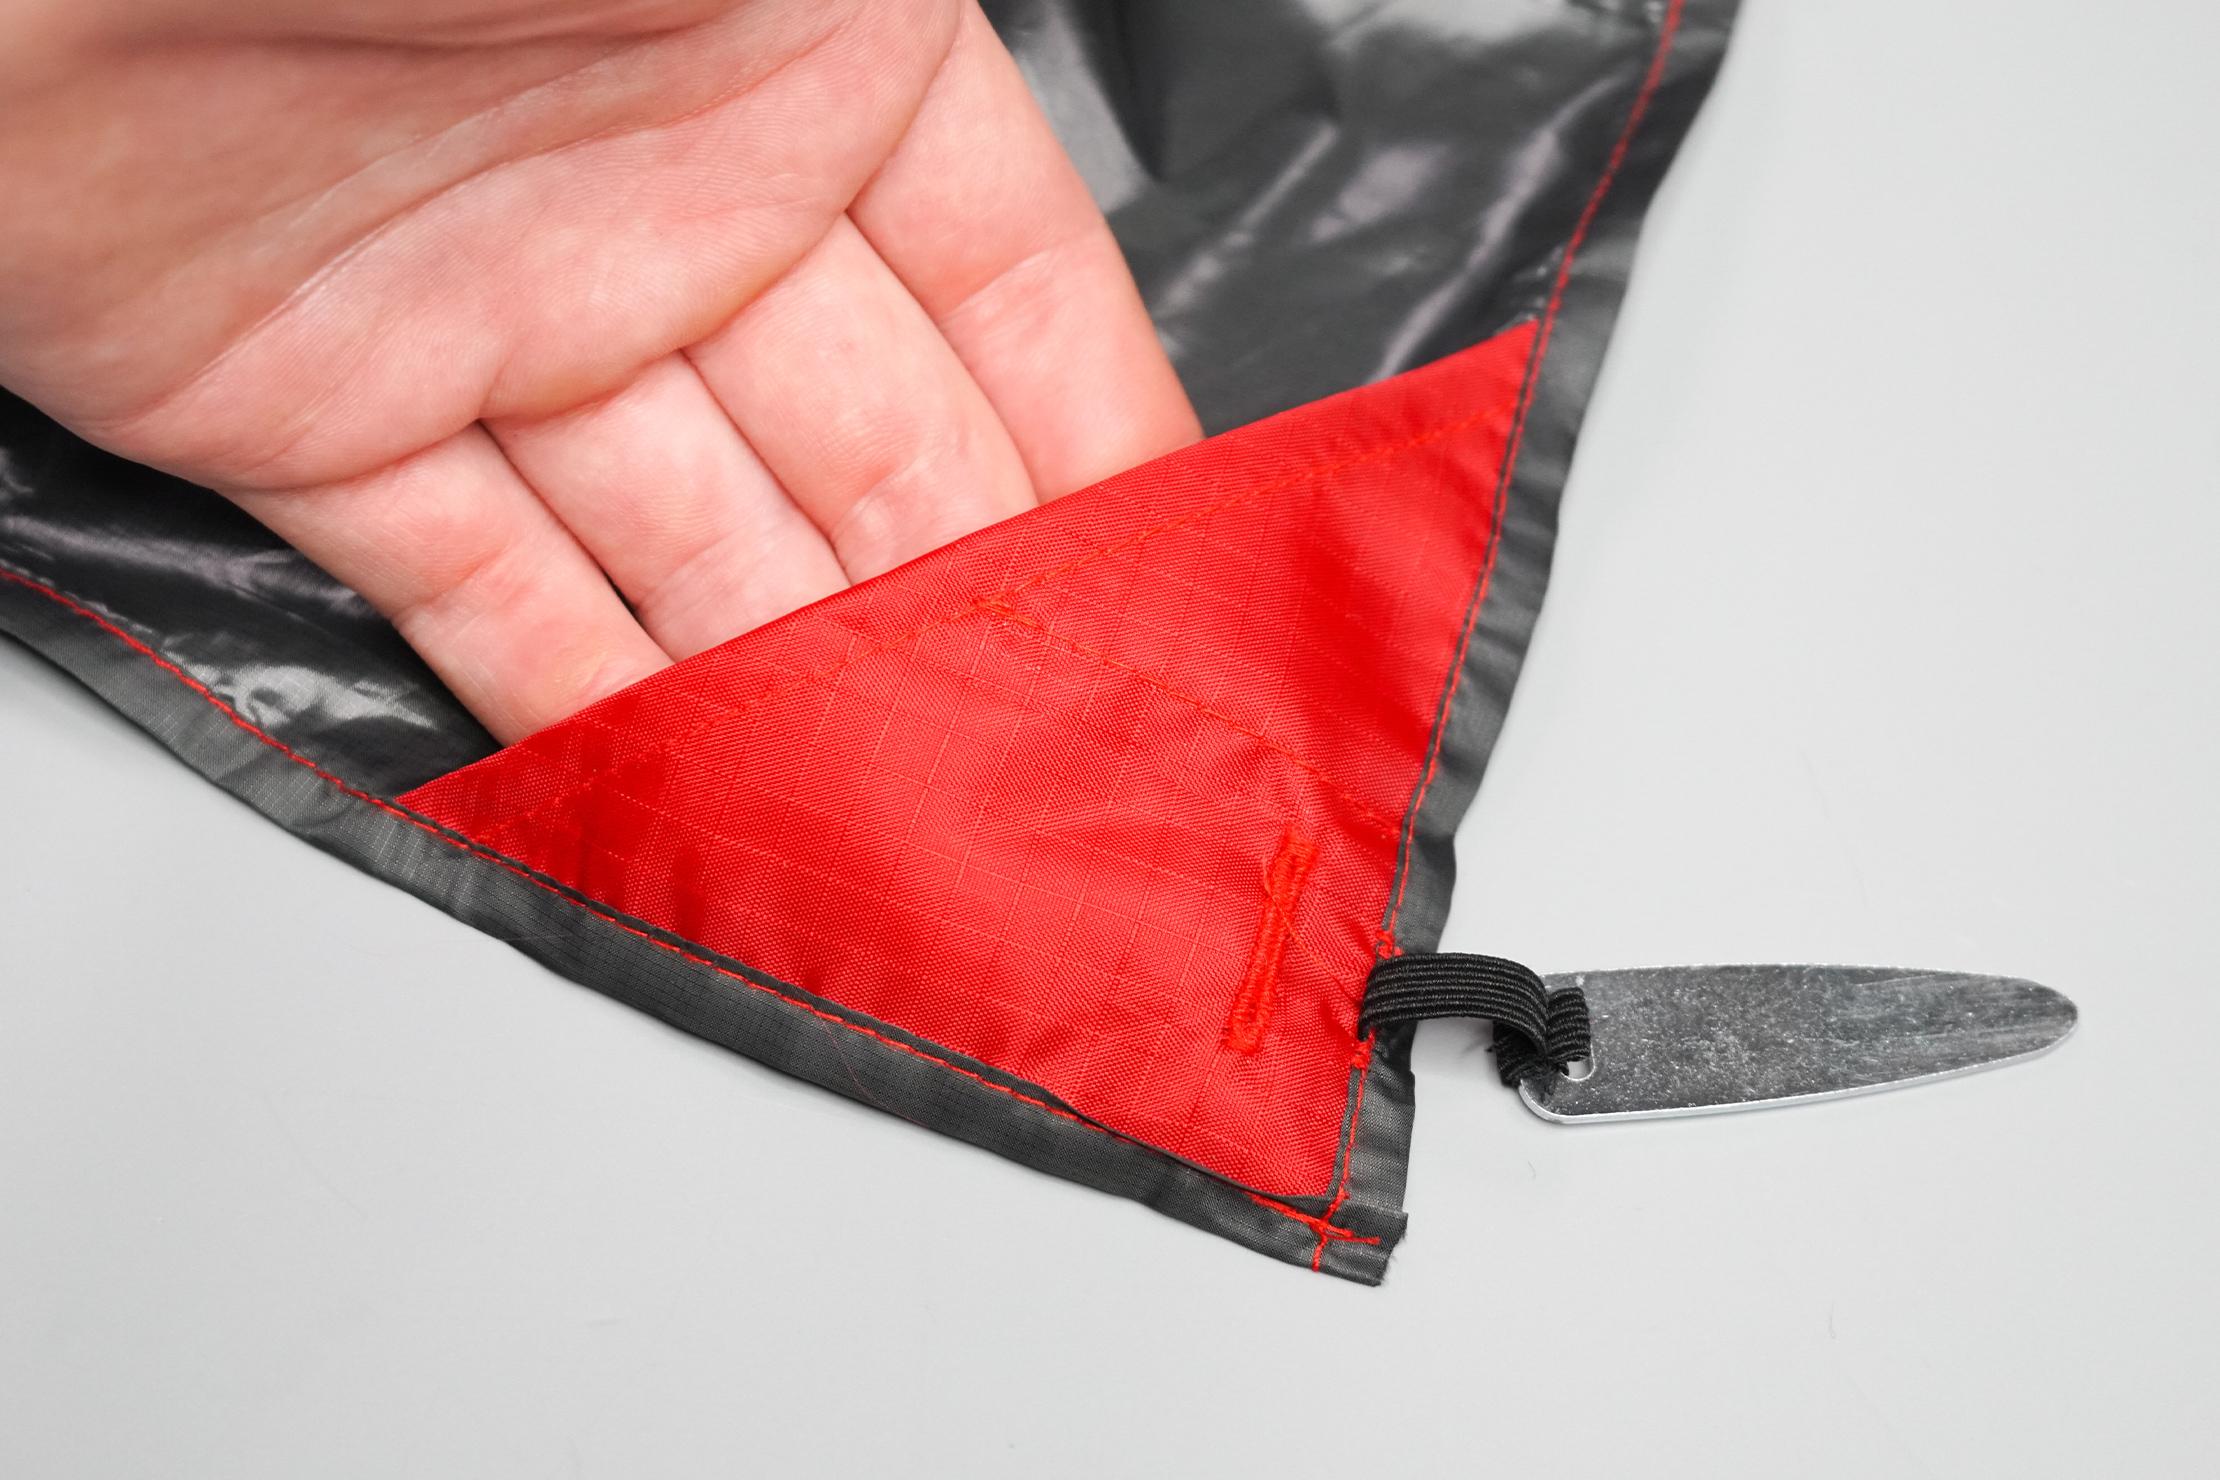 Matador Pocket Blanket 2.0 Stake and Pocket